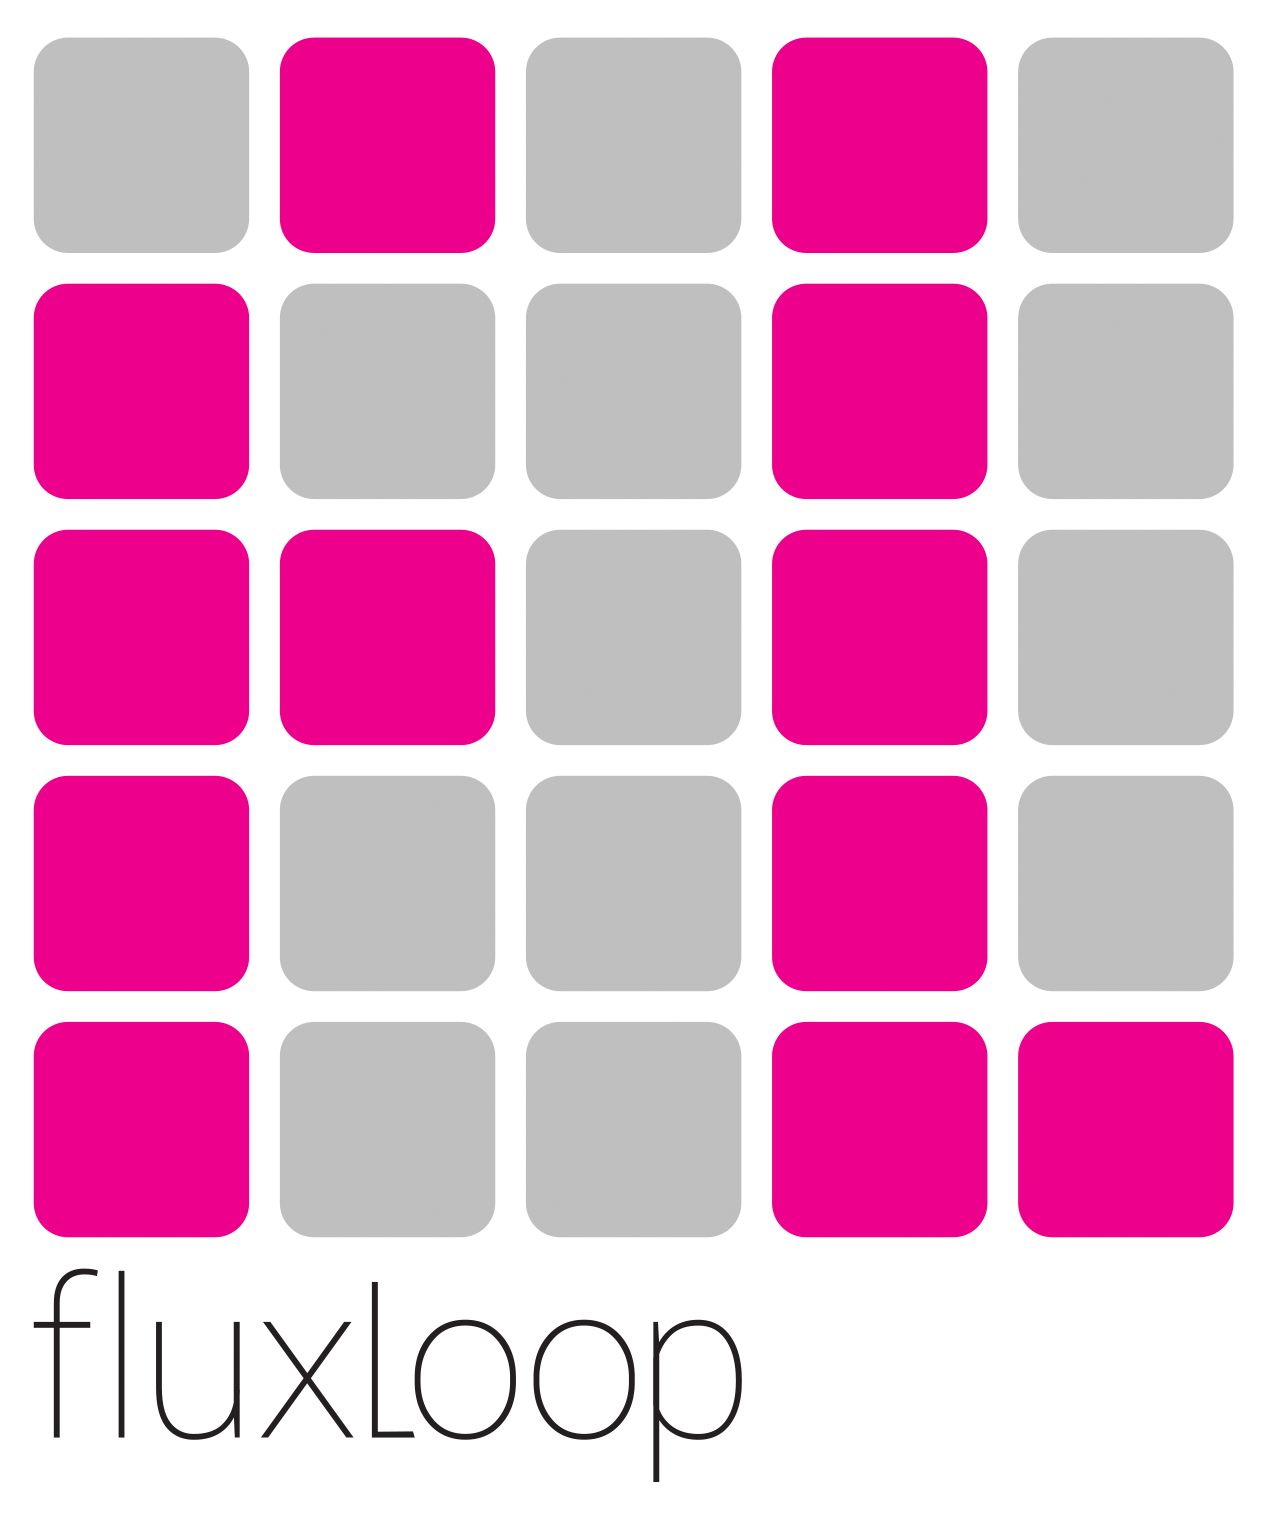 fluxLoop logo.